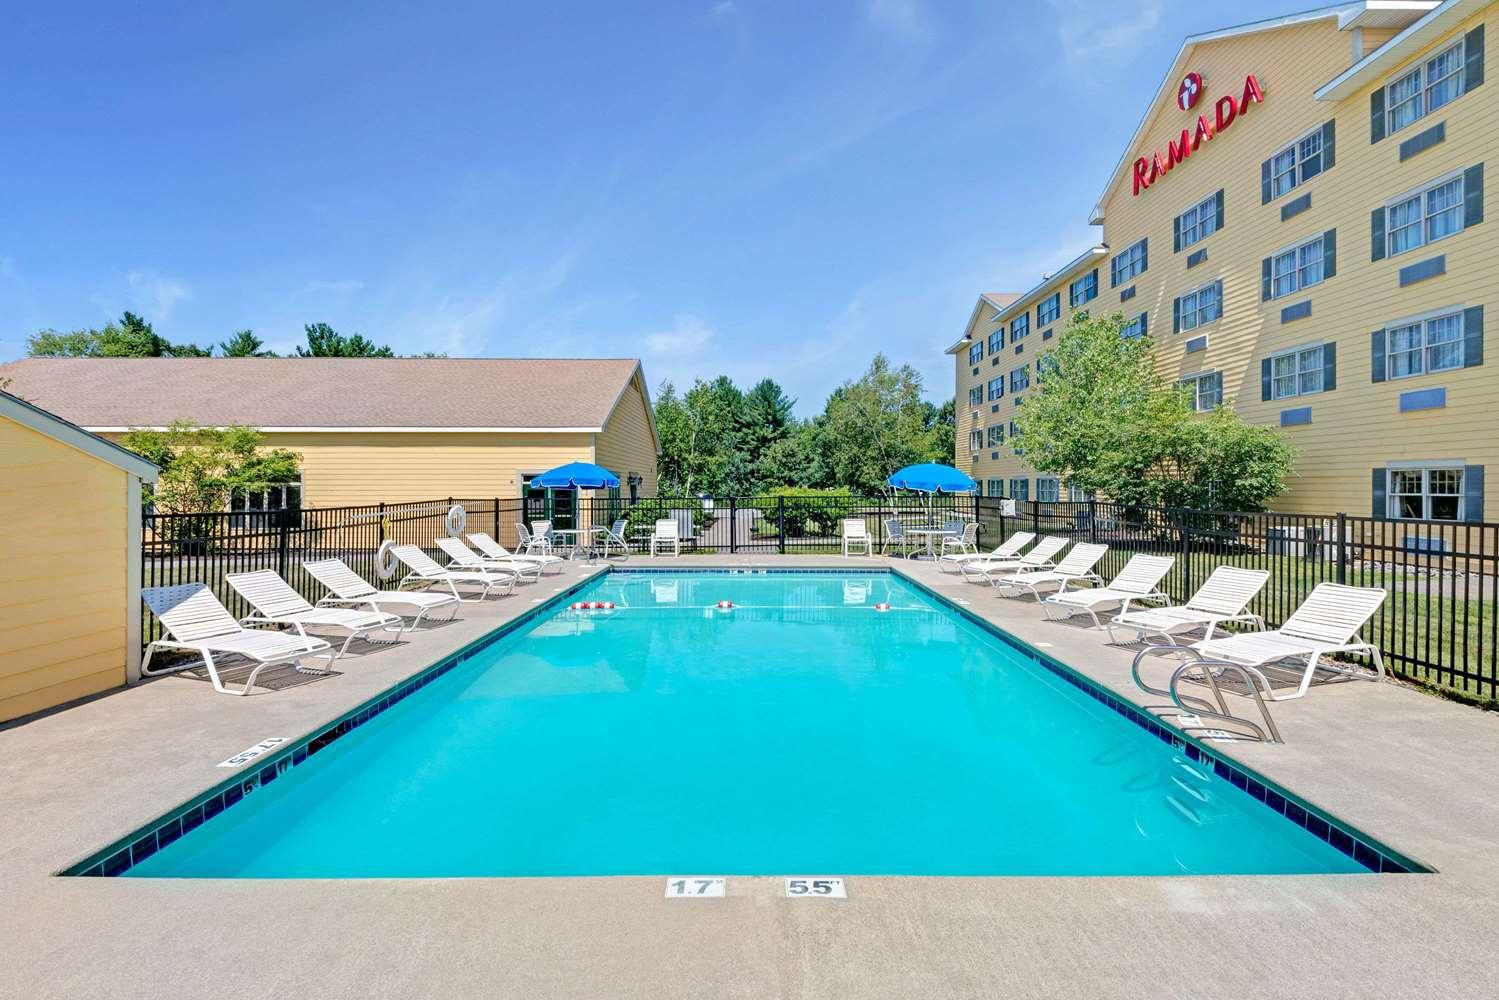 Pool - Ramada Hotel Old Orchard Beach Area Saco